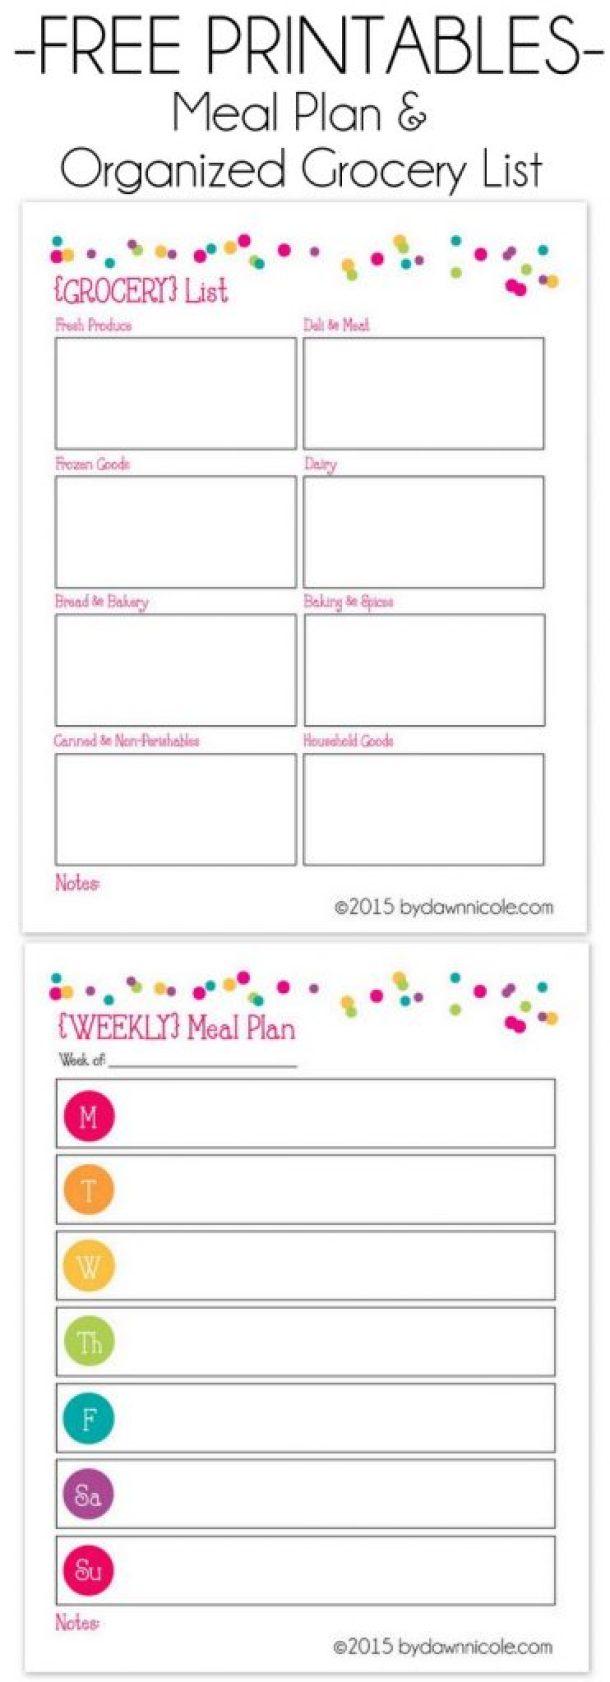 Organizational Printables - FREE Printable Meal Plan and Grocery Lists via Dawn Nicole Designs